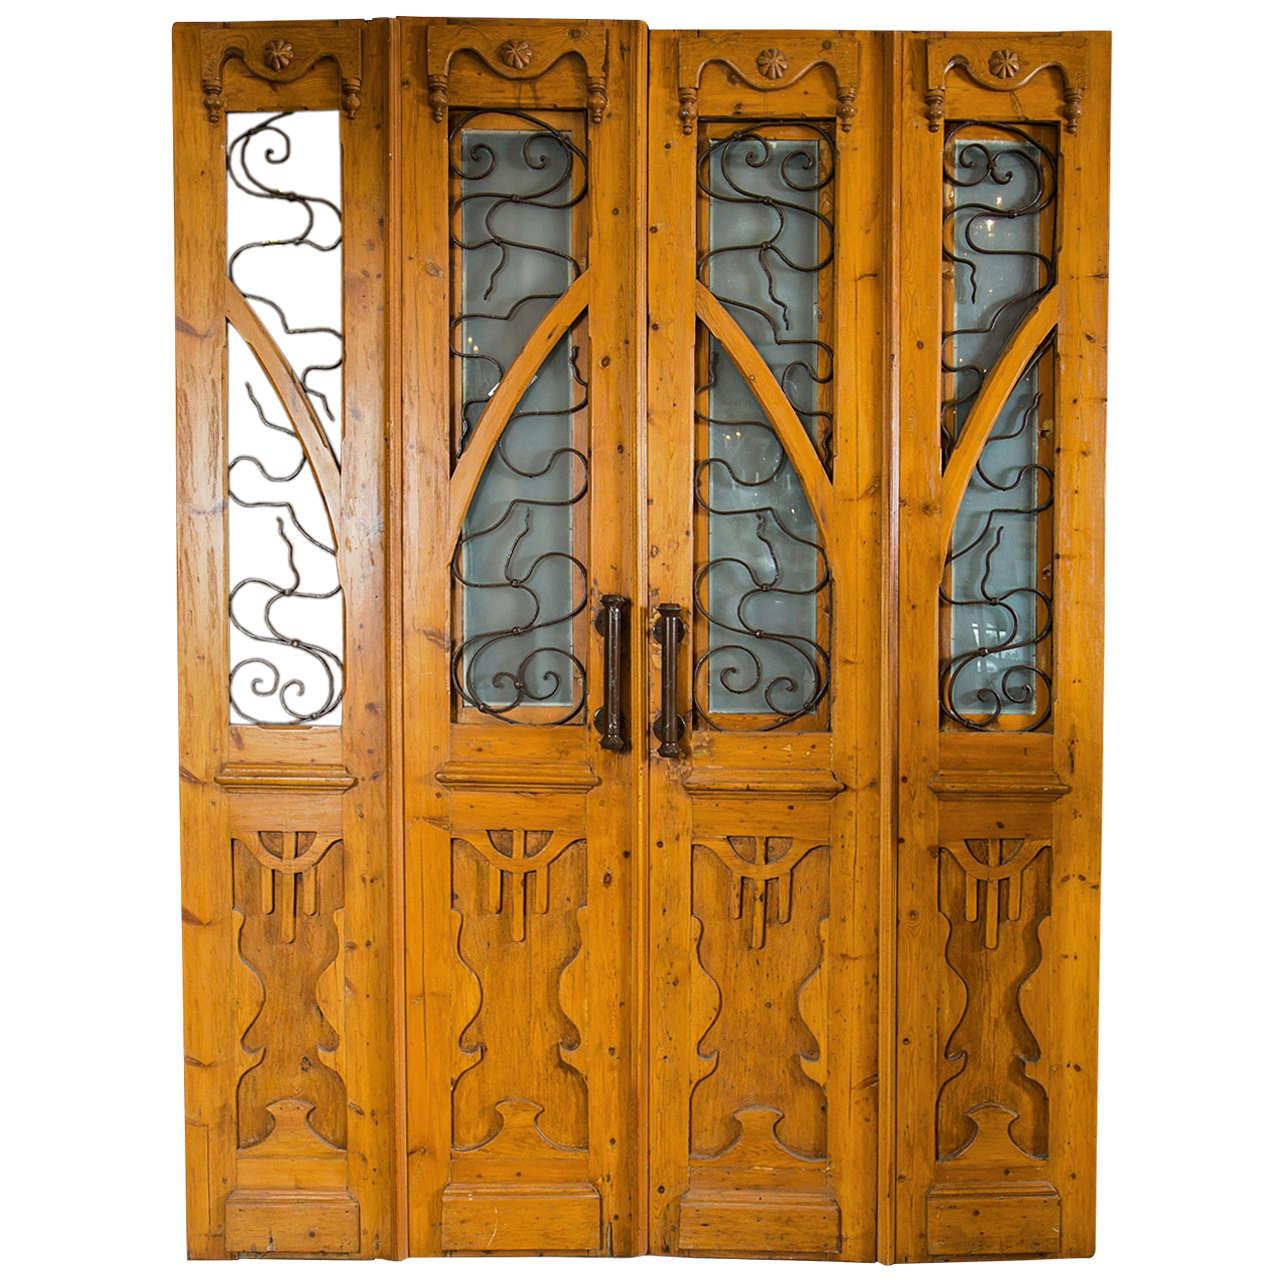 Antique Pine European Art Nouveau Doors Set For Sale - Antique Pine European Art Nouveau Doors Set At 1stdibs